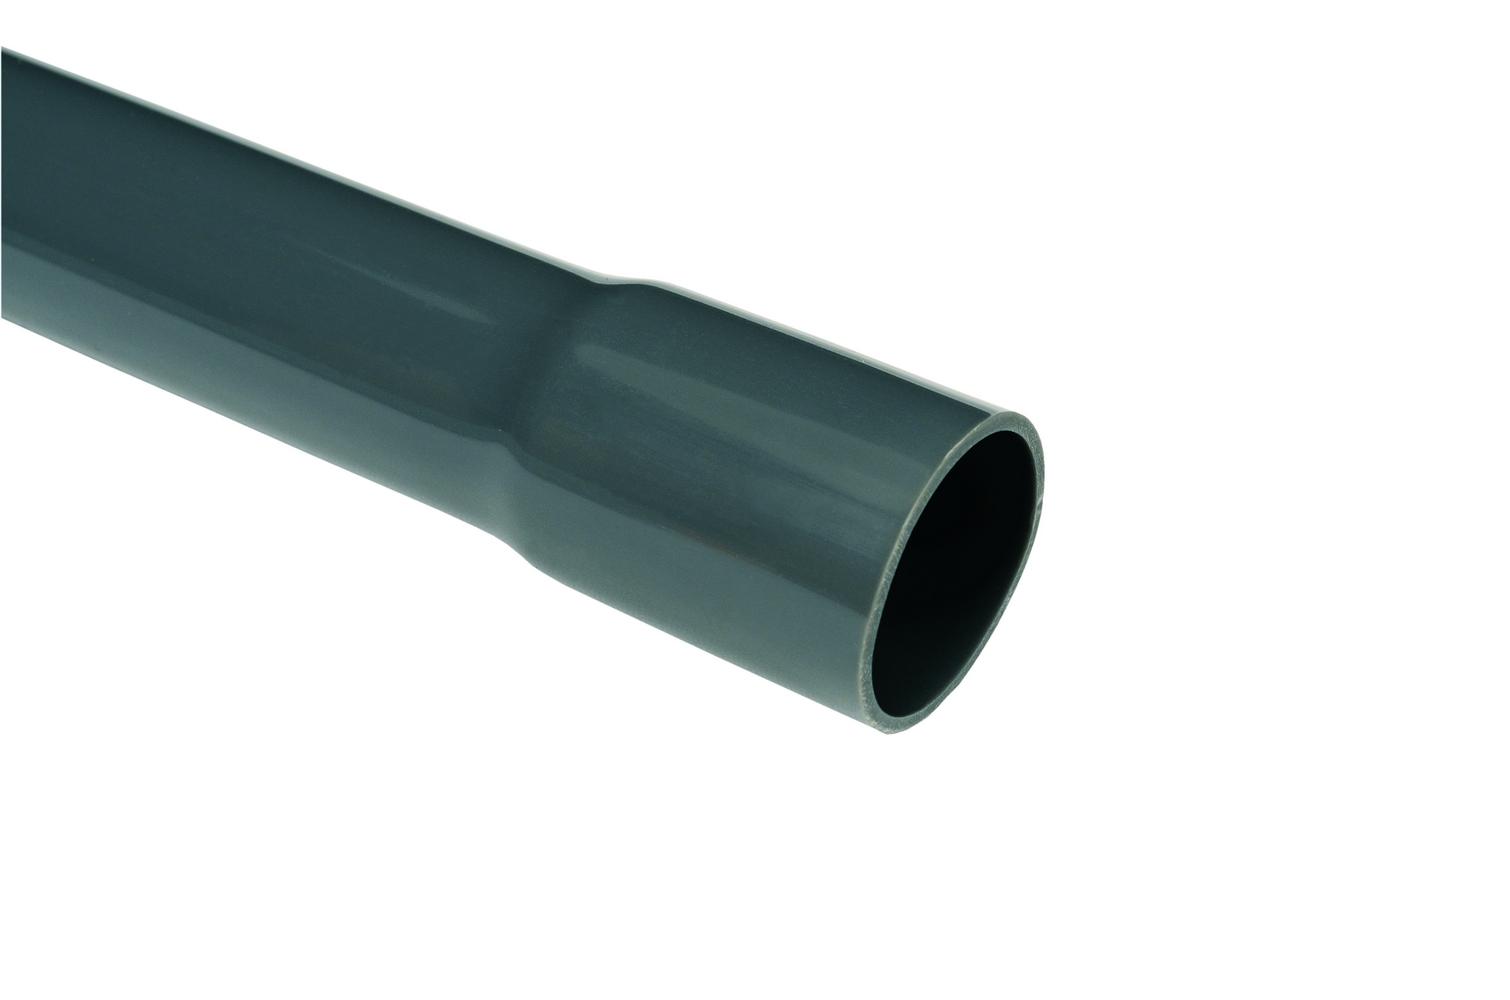 Trubka tuhá hrdlovaná PVC 750 N pr. 25 mm (3m)